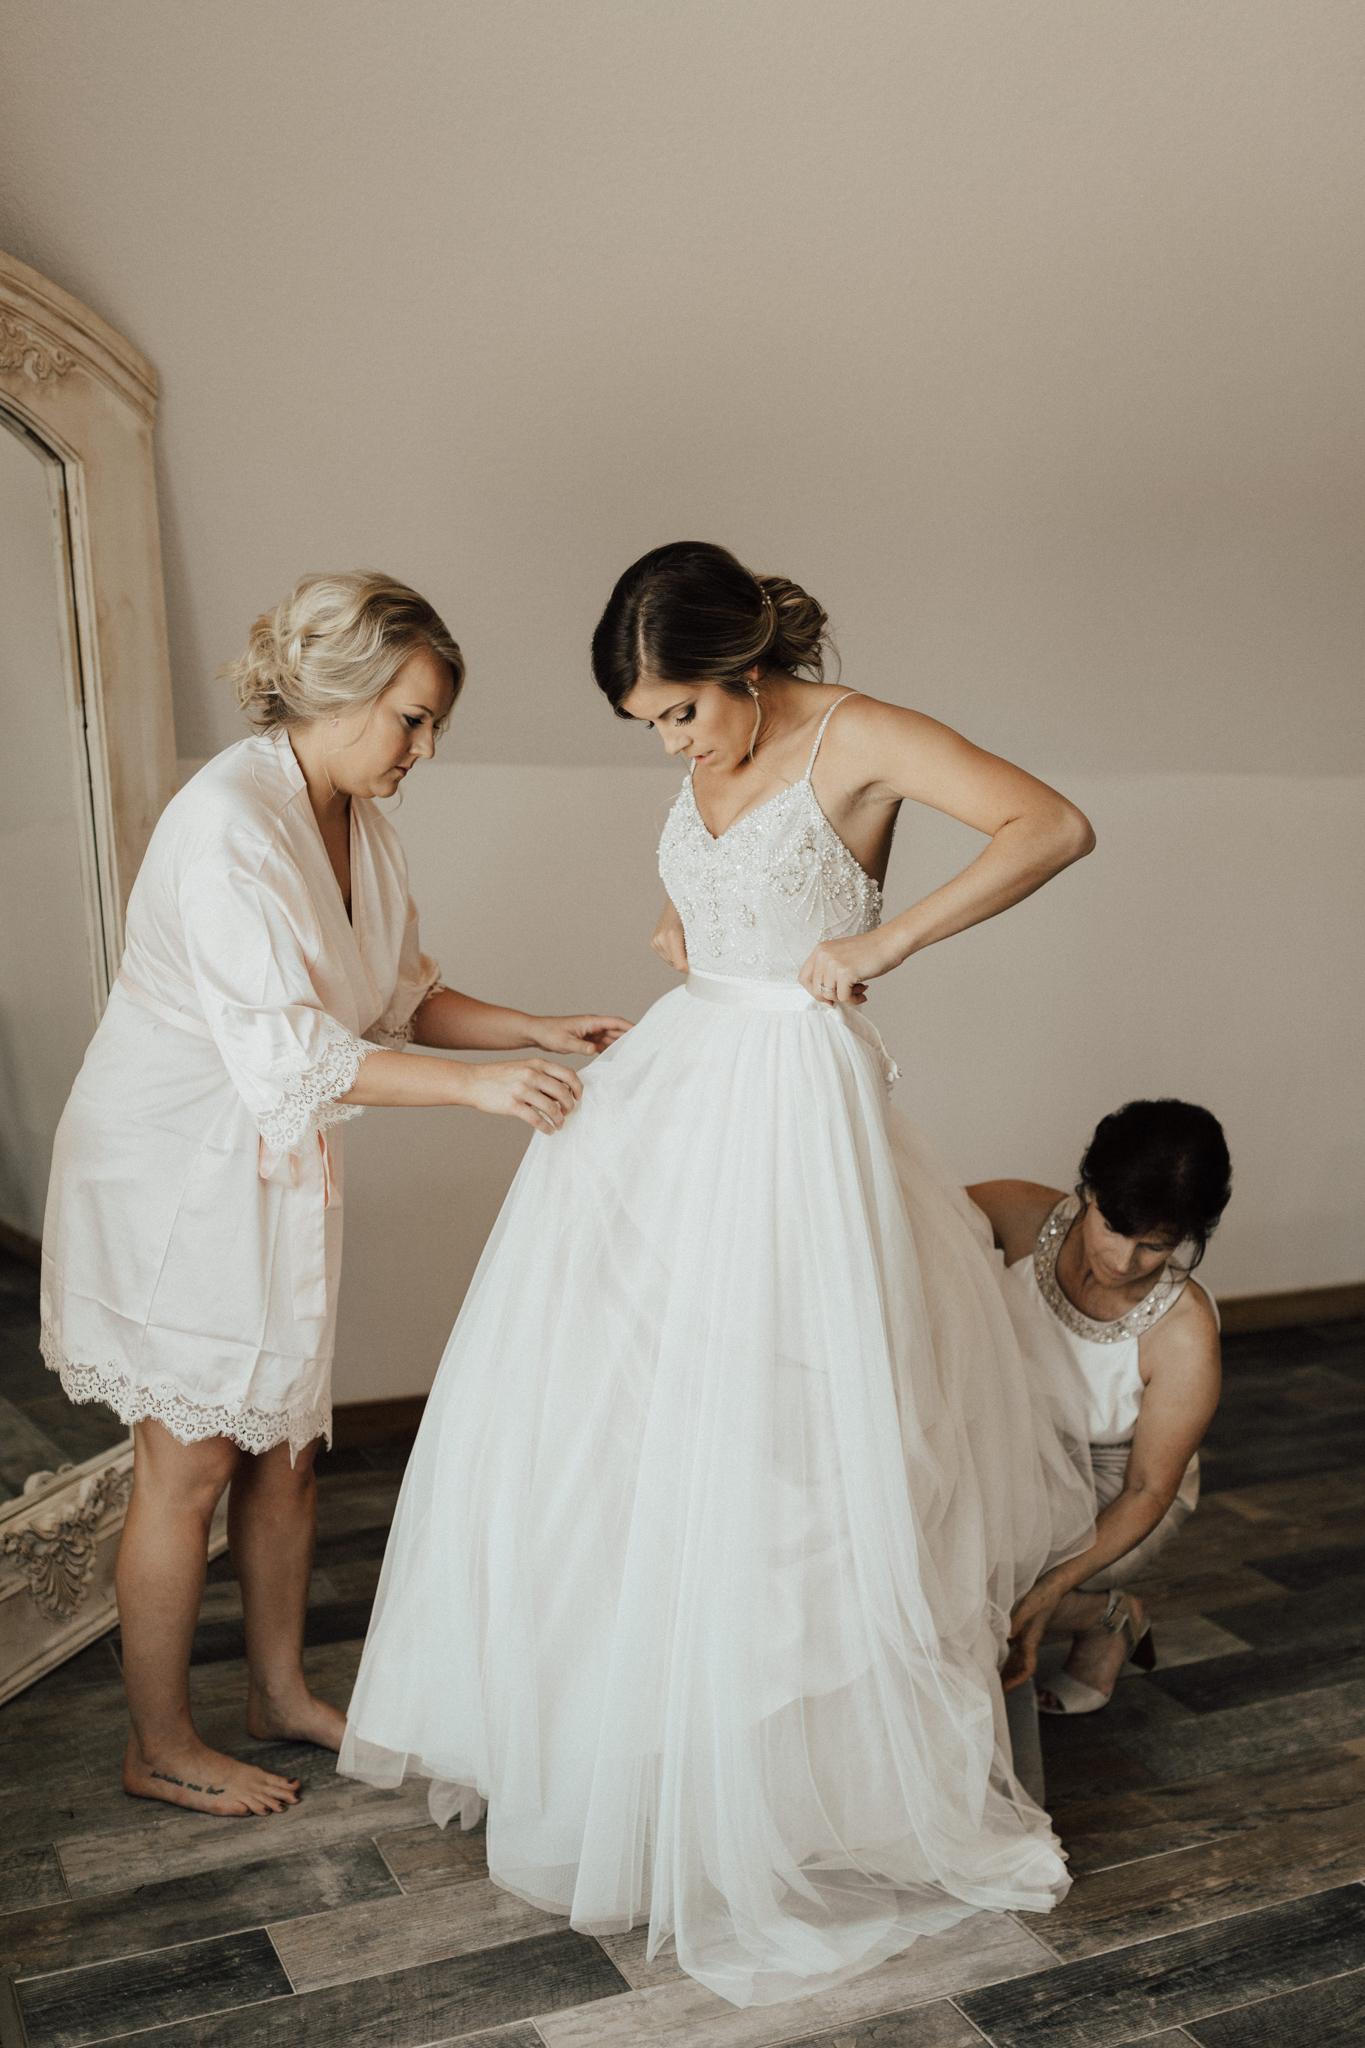 Arizona-Adventure-Elopement-Wedding-Photographer-104.jpg